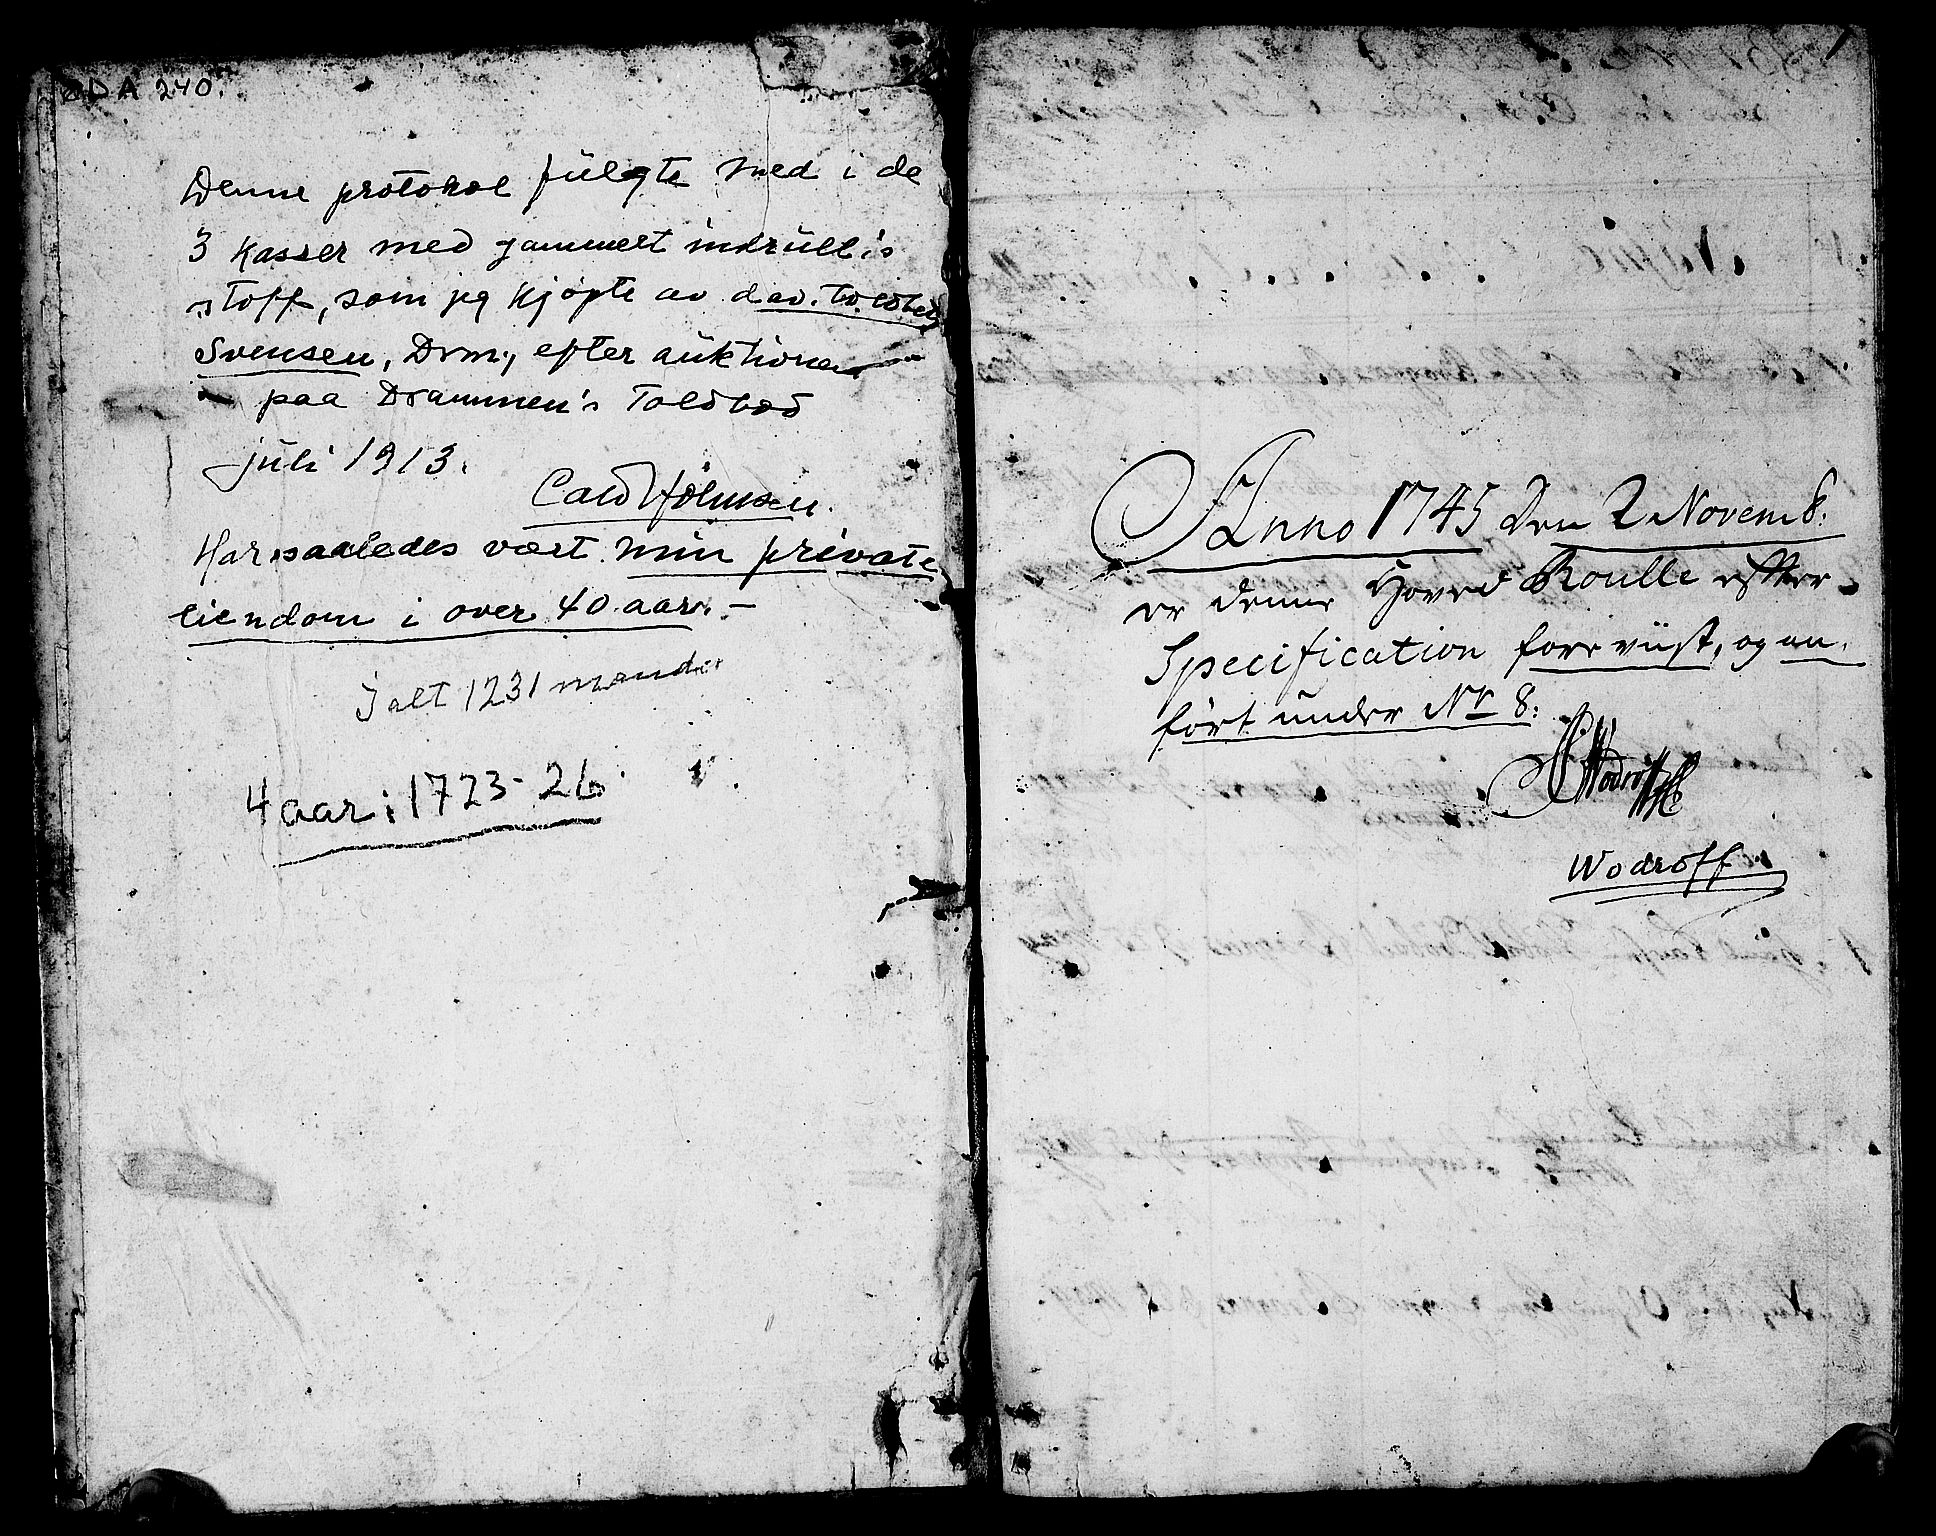 SAKO, Drammen innrulleringsdistrikt, F/Fa/L0002: Hovedrulle, 1723-1726, s. 2